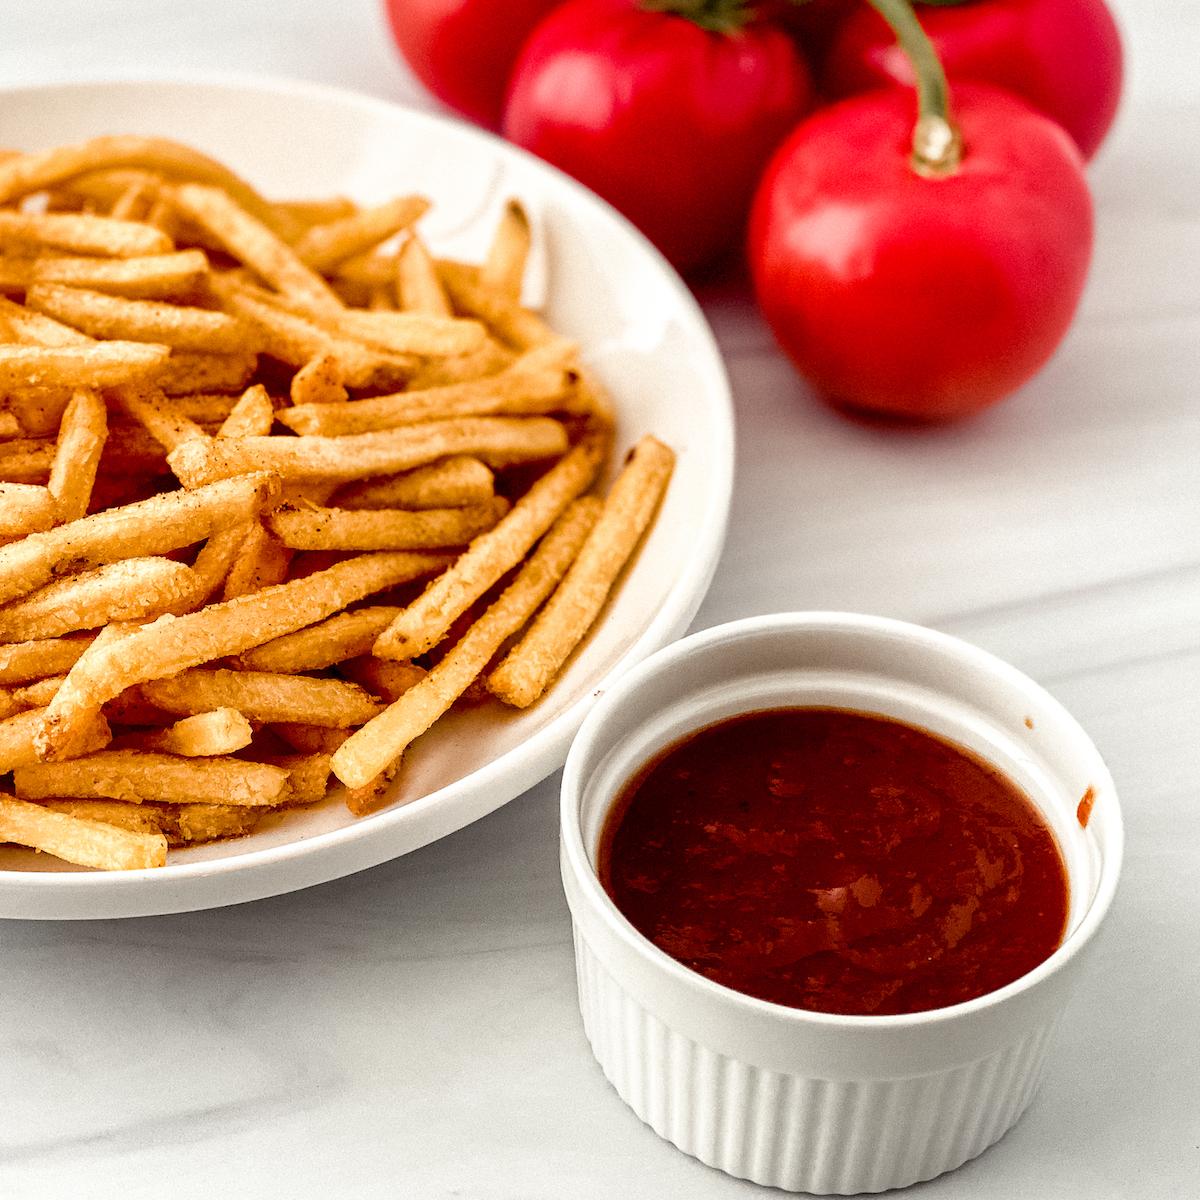 homemade ketchup and fries